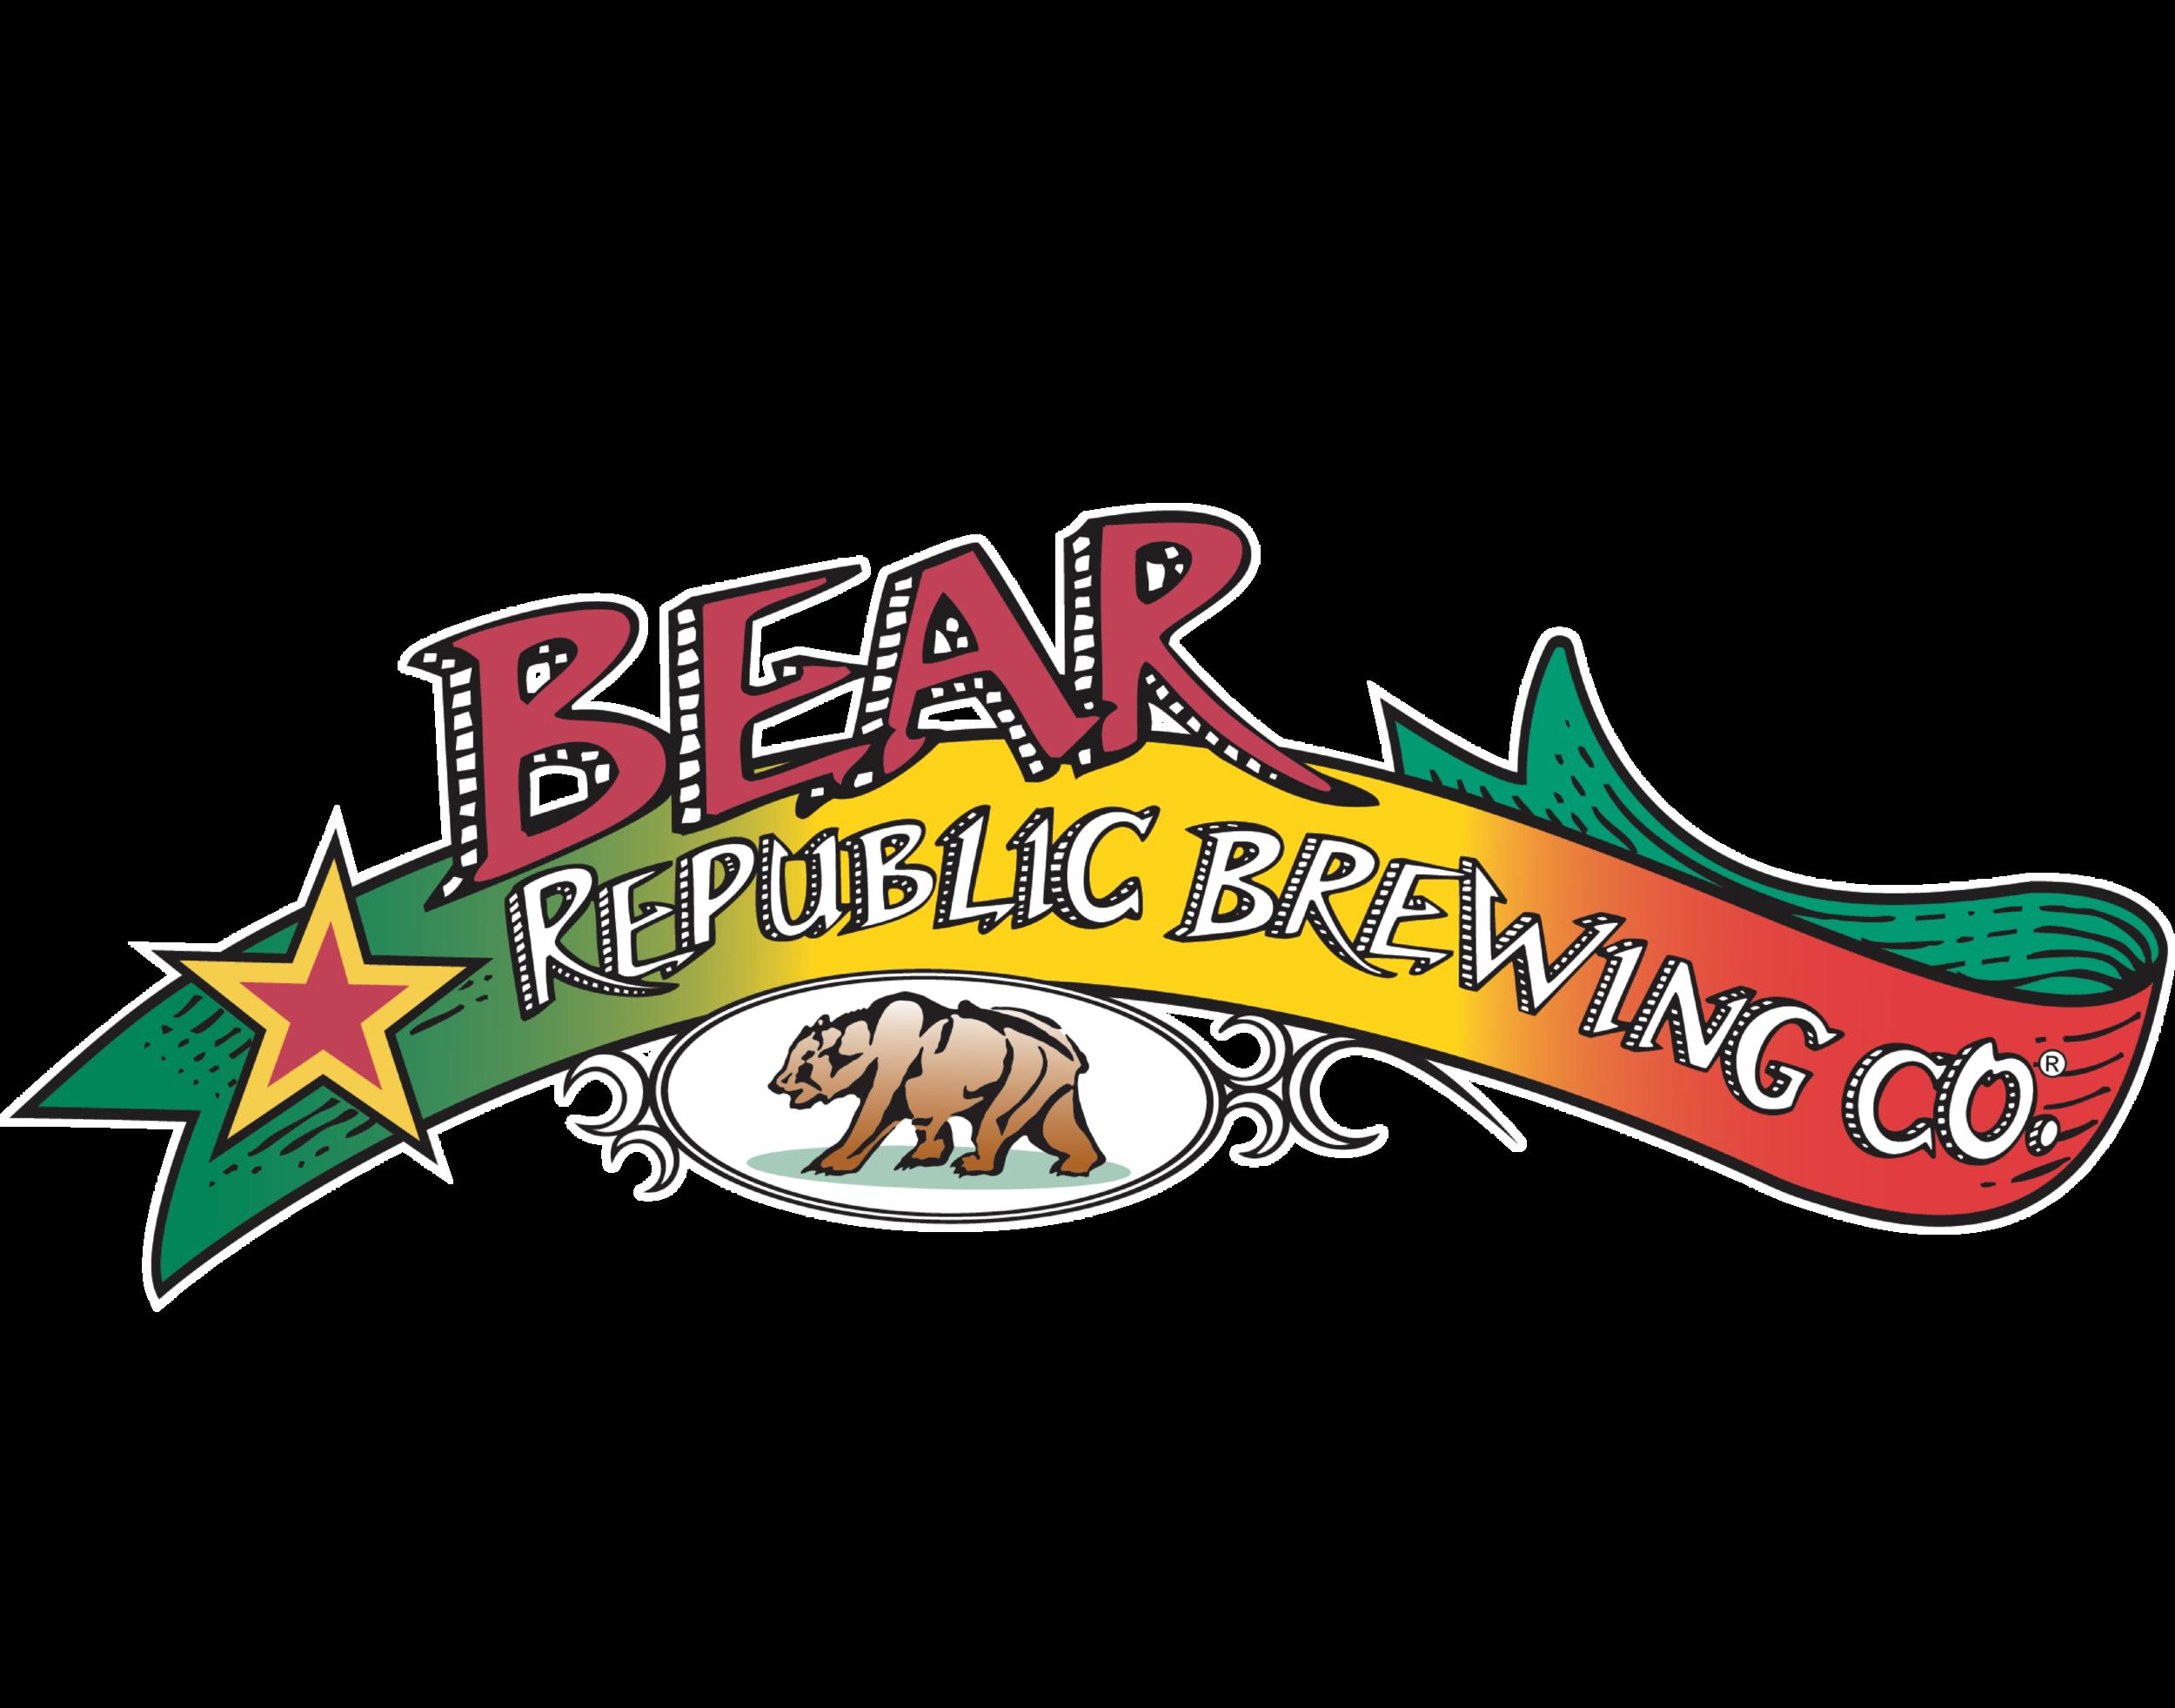 Bear Republic Brewing Co. logo. Links to Bear Republic website.